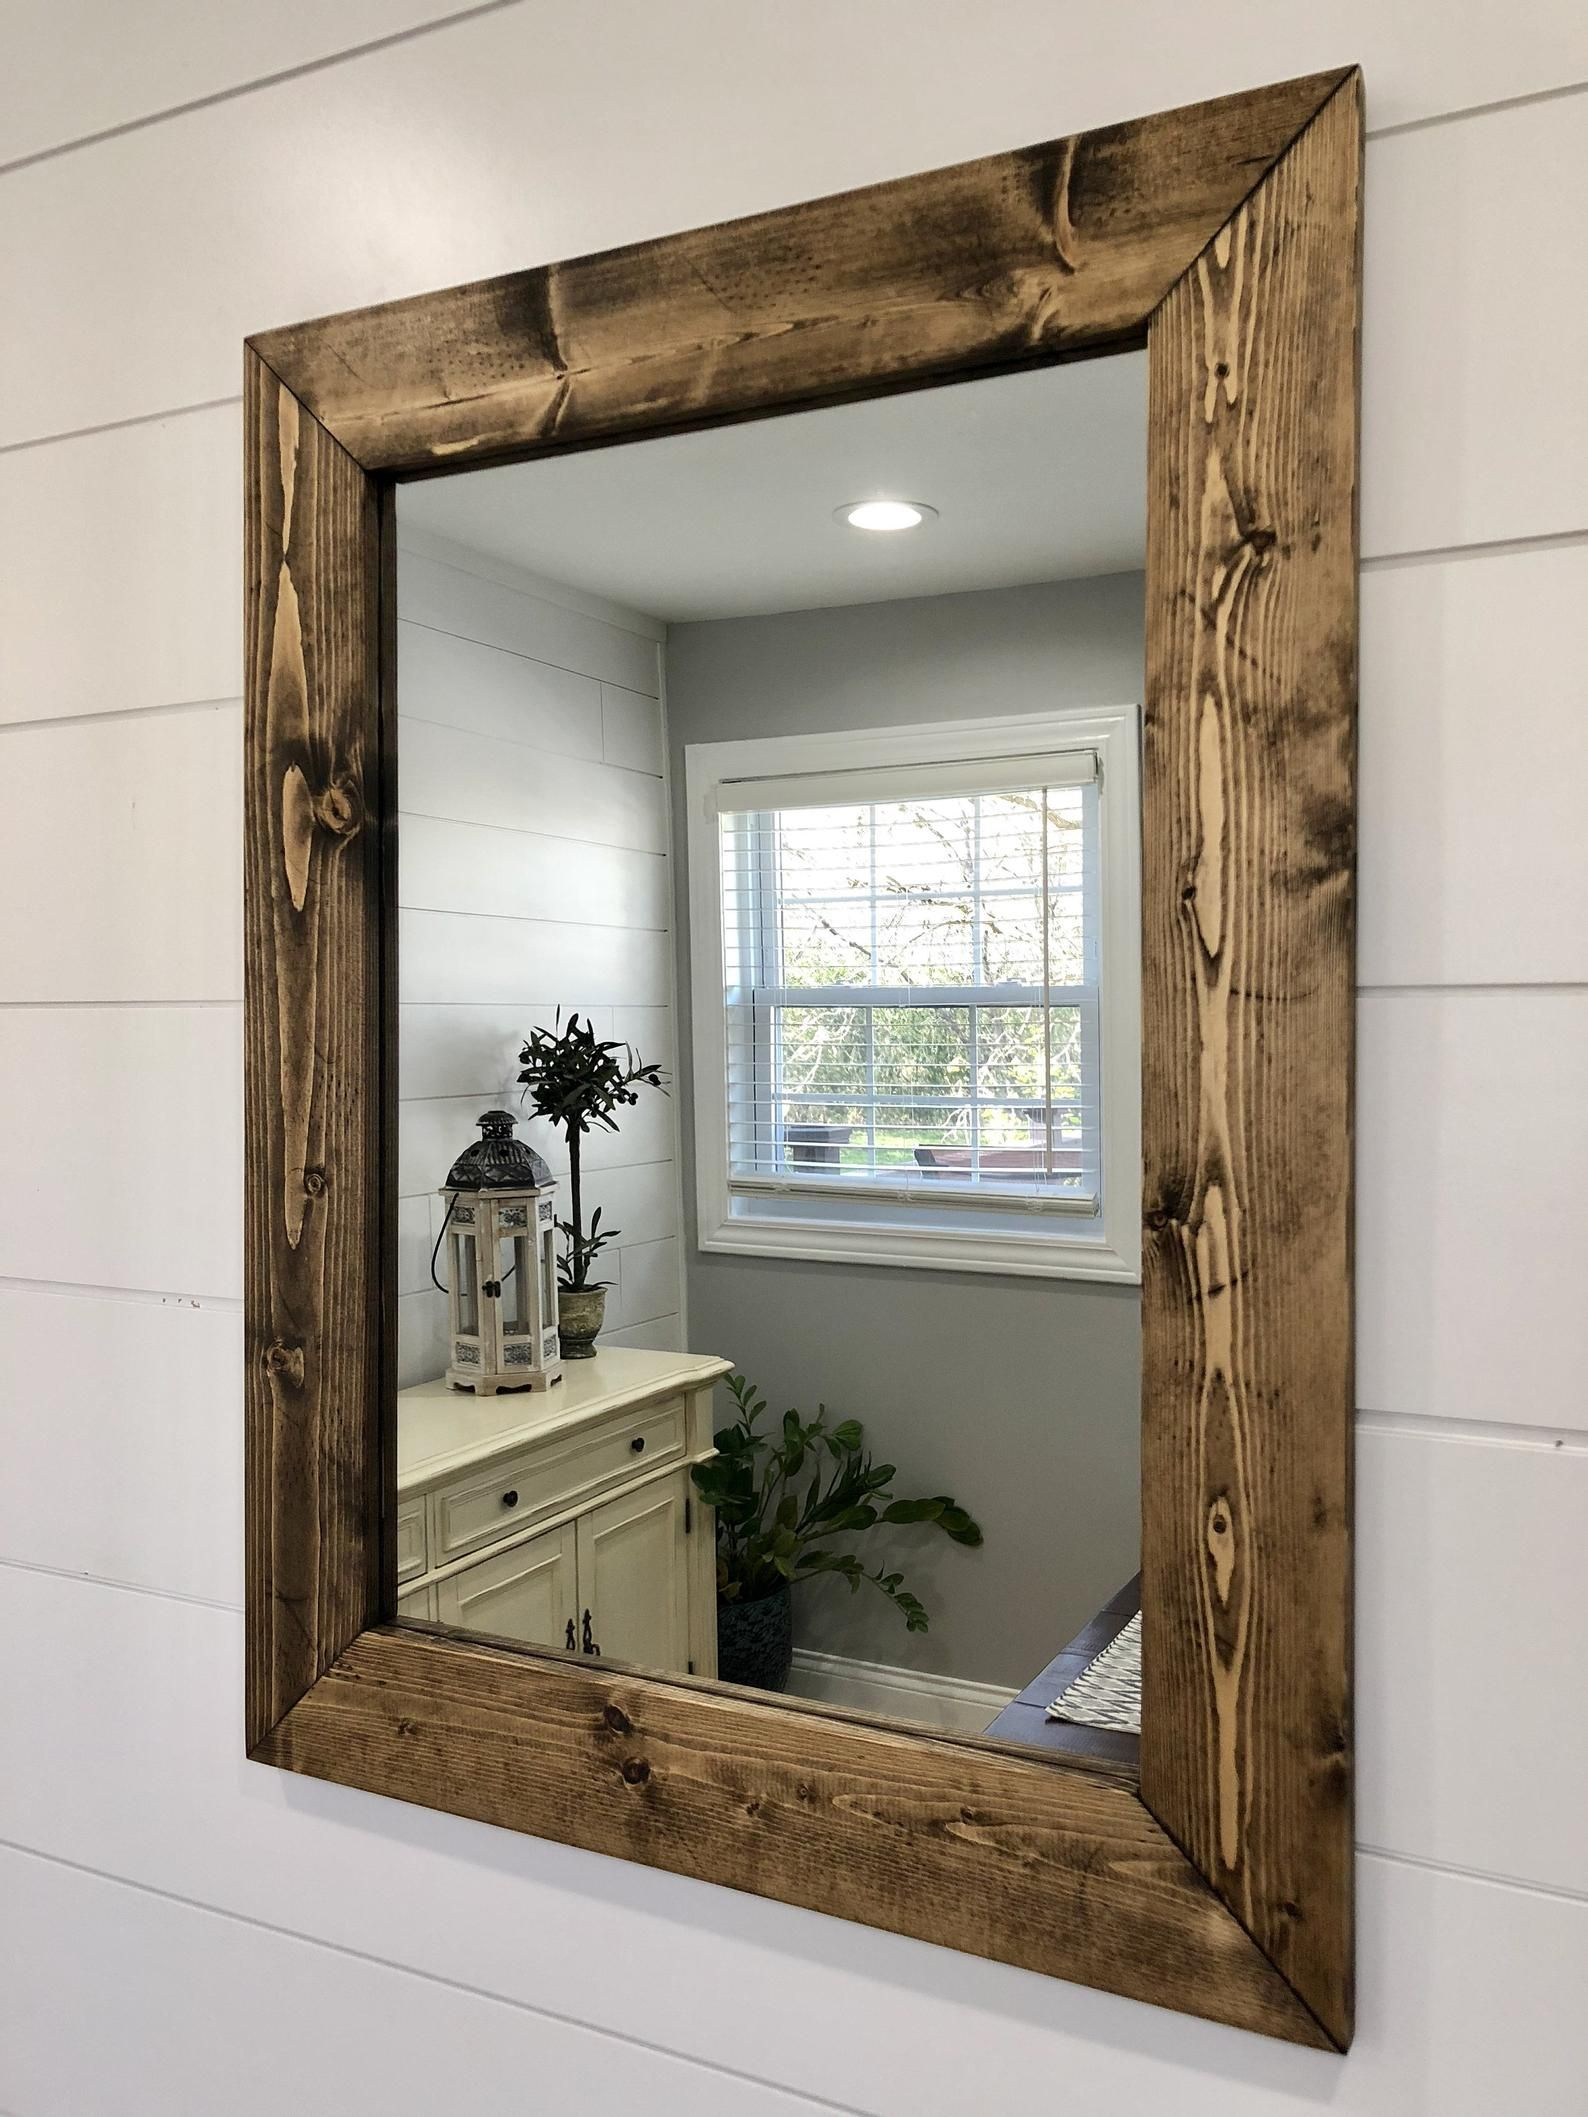 Dark Walnut Mirror Wood Frame Mirror Handmade Rustic Wood Etsy Wood Framed Mirror Wood Mirror Wood Picture Frames Rustic